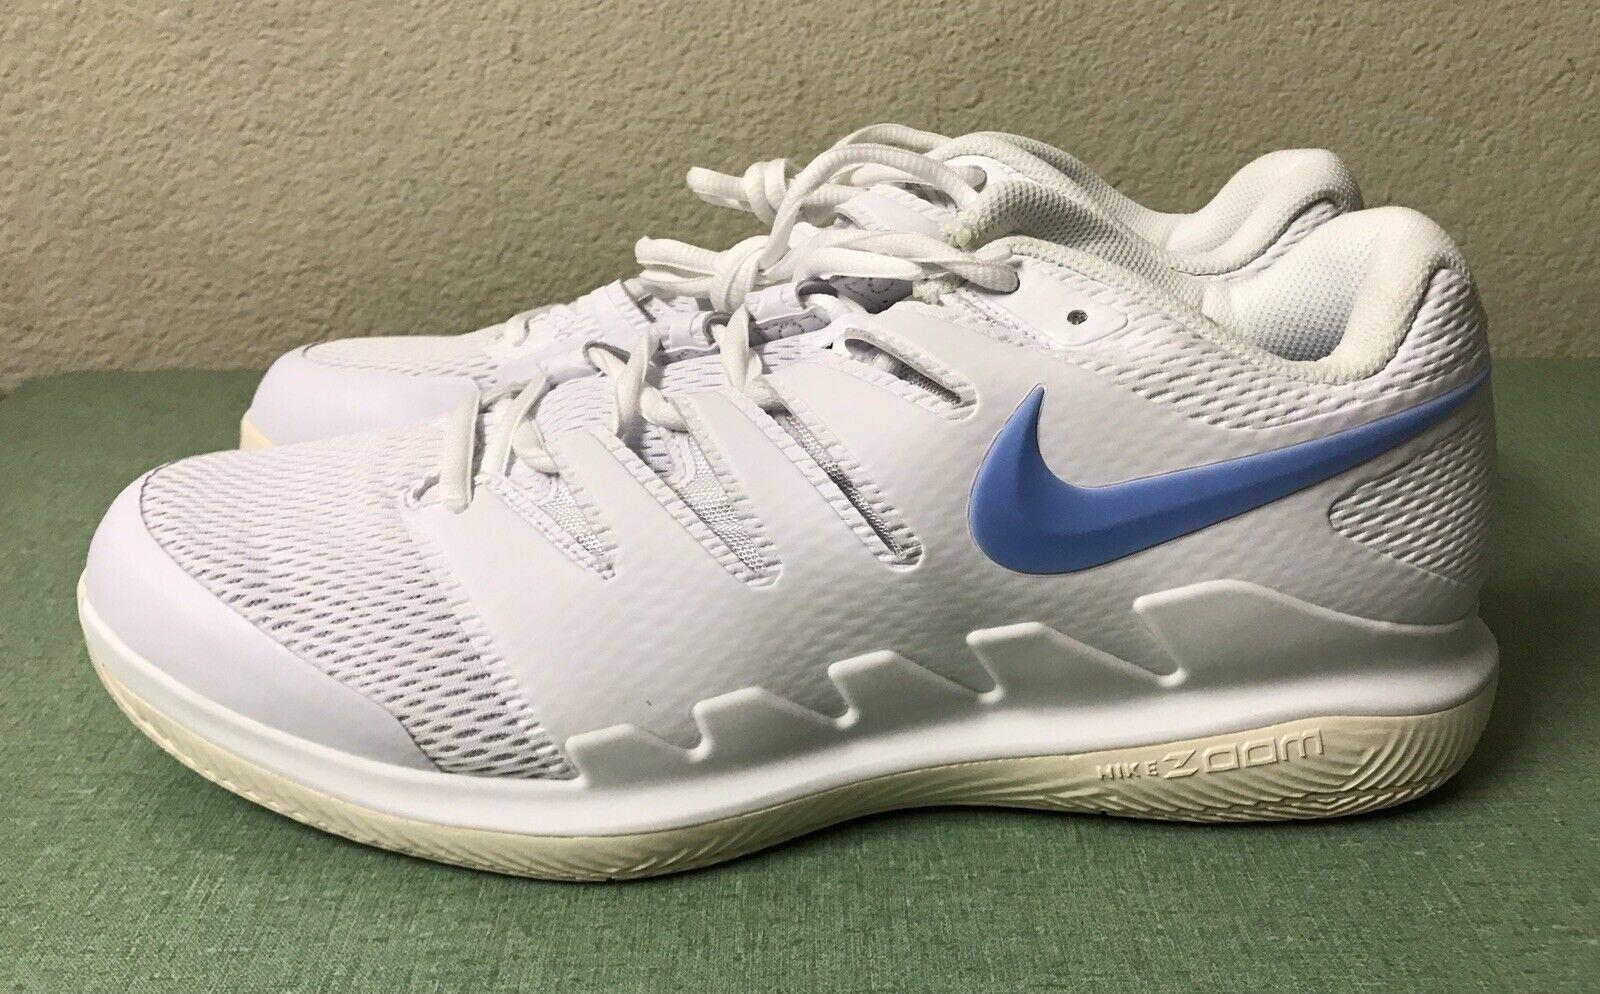 Nike Air Zoom Vapor X HC White bluee Tennis shoes Mens Sz 12.5 Federer Nadal NEW